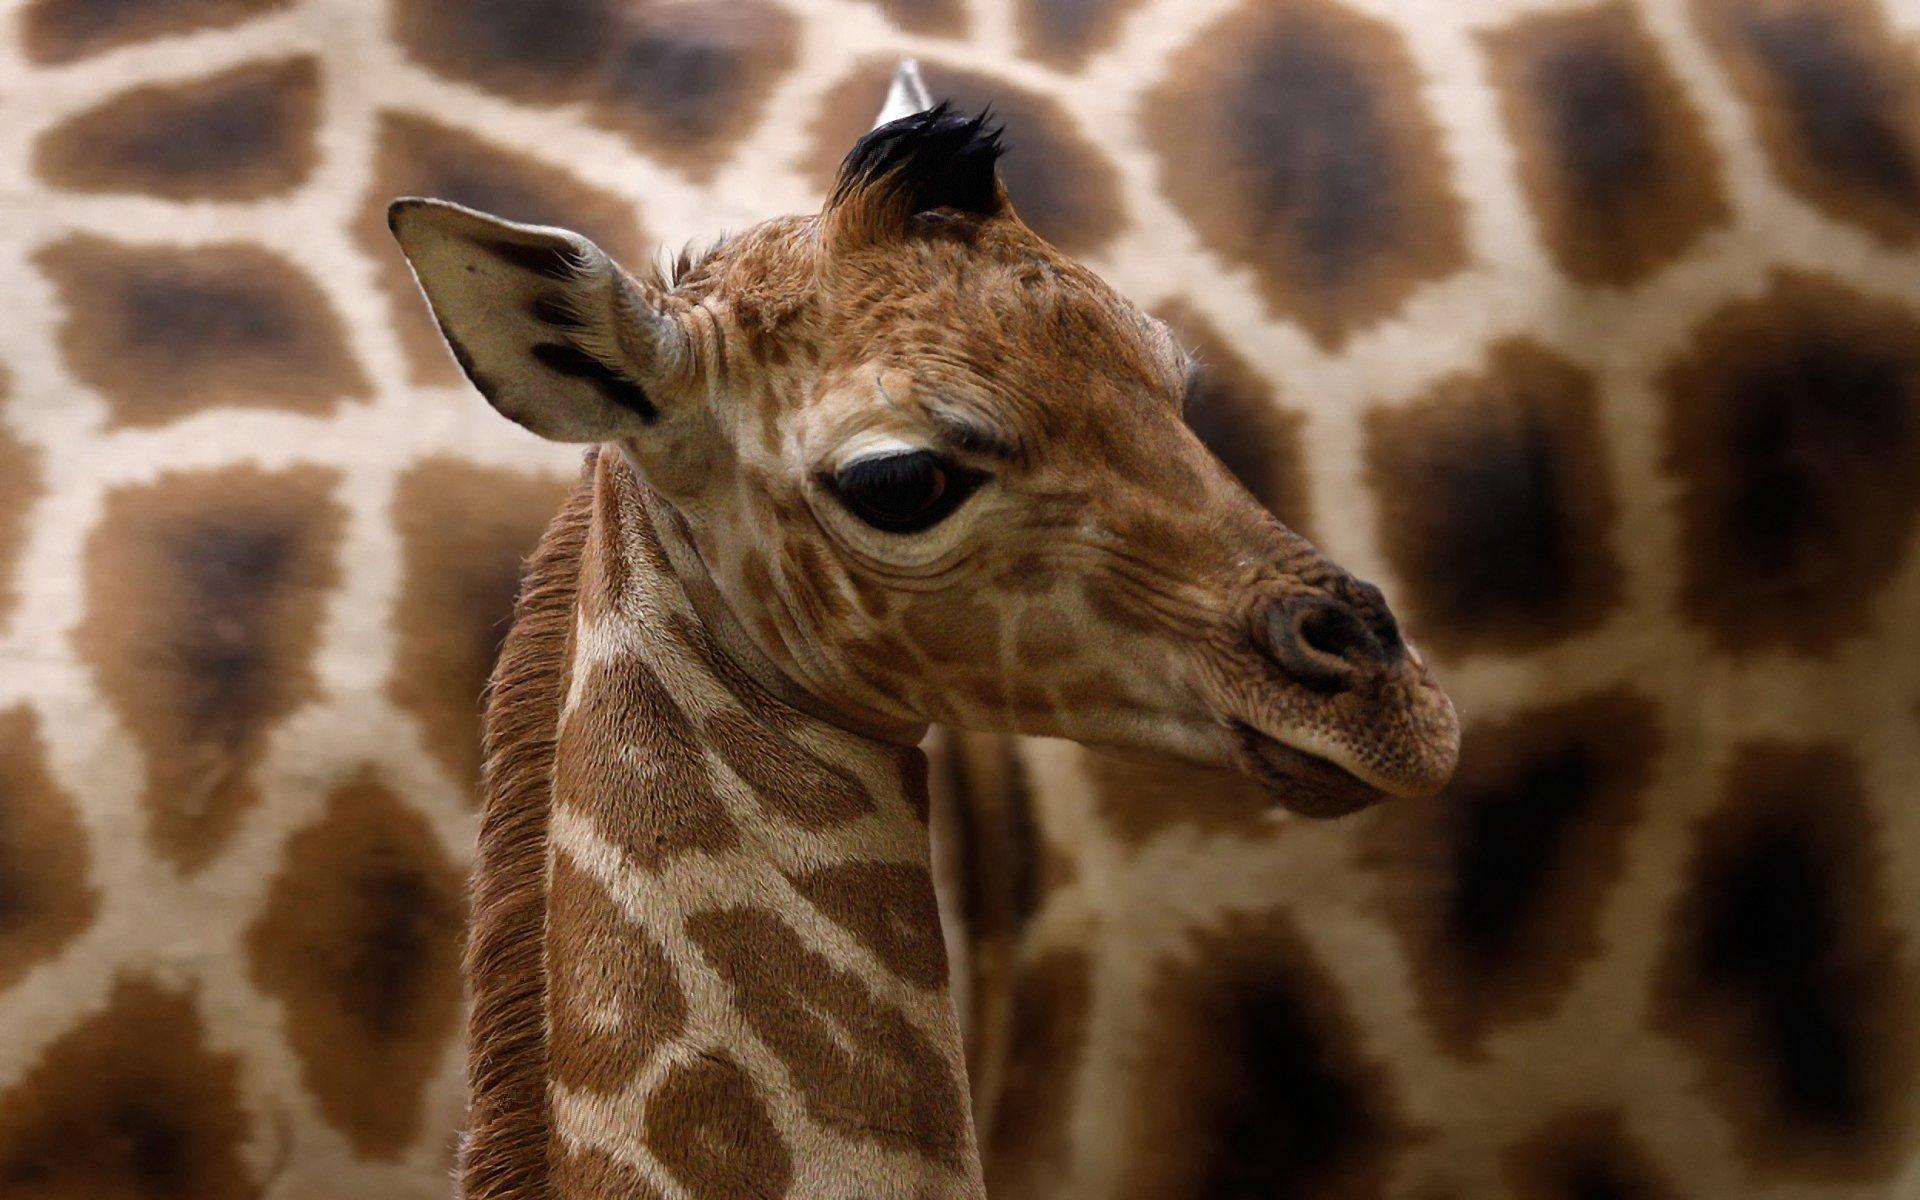 giraffe animal hd wallpaper 2288